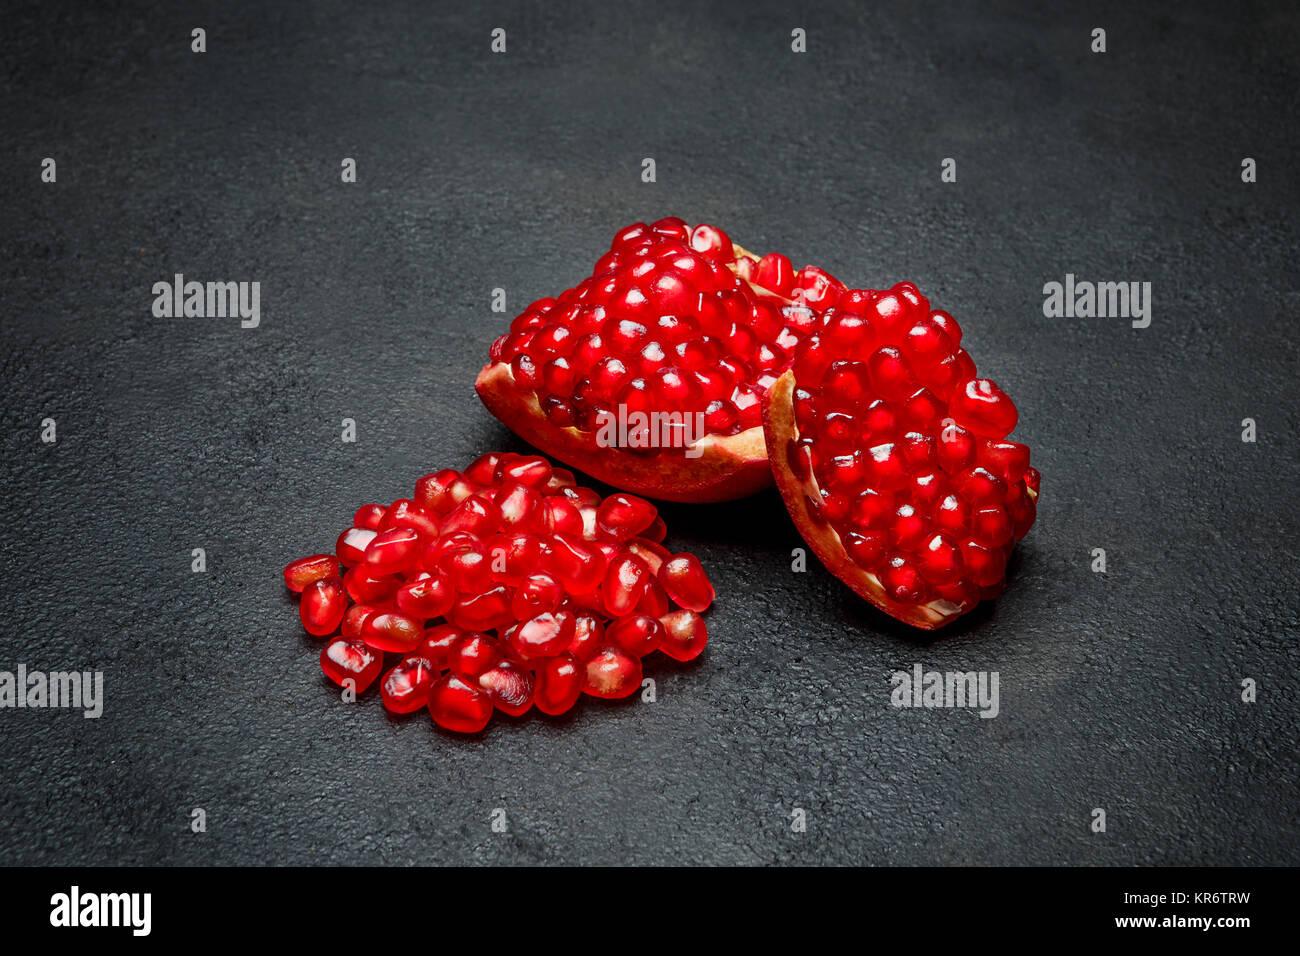 Pomegranate seeds close-up on dark concrete background - Stock Image